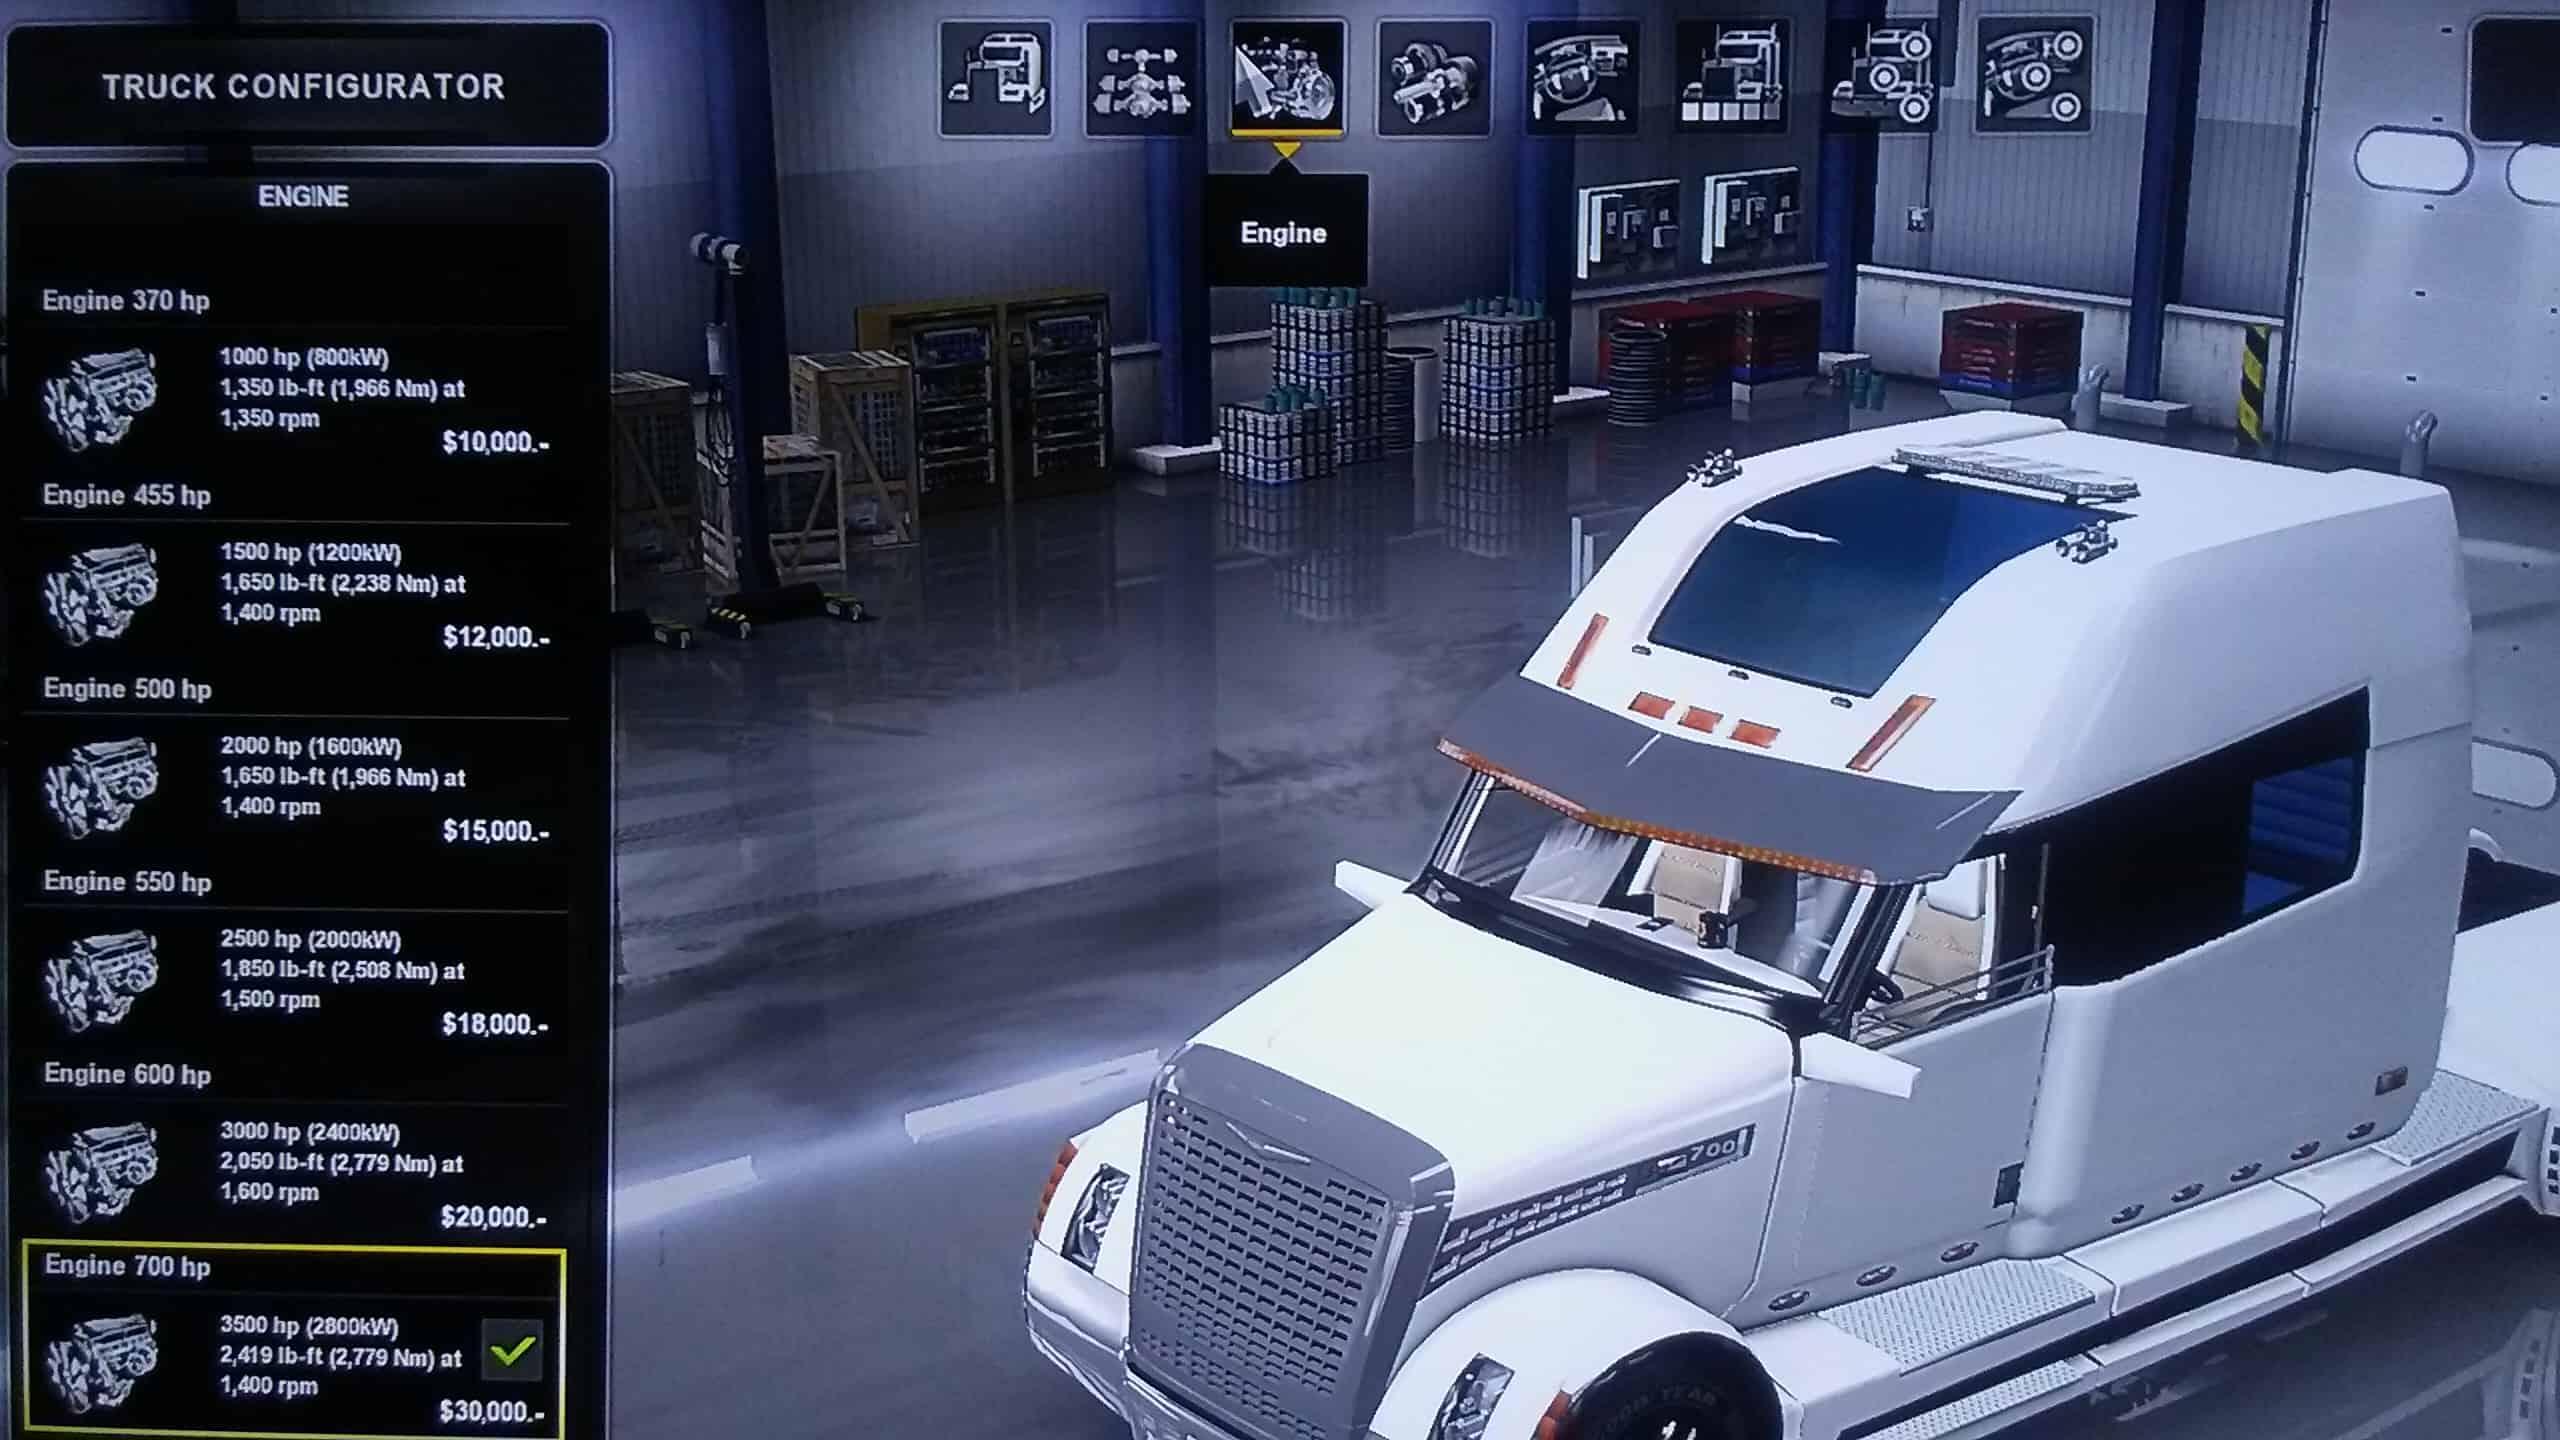 Concept truck 2020 ATS - American Truck Simulator mod | ATS mod